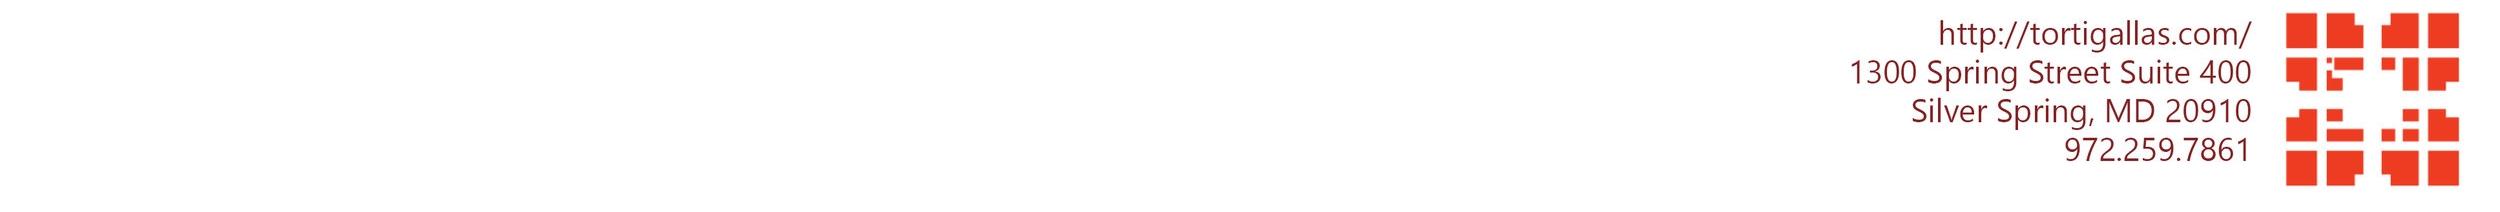 David Otieno banner.jpg